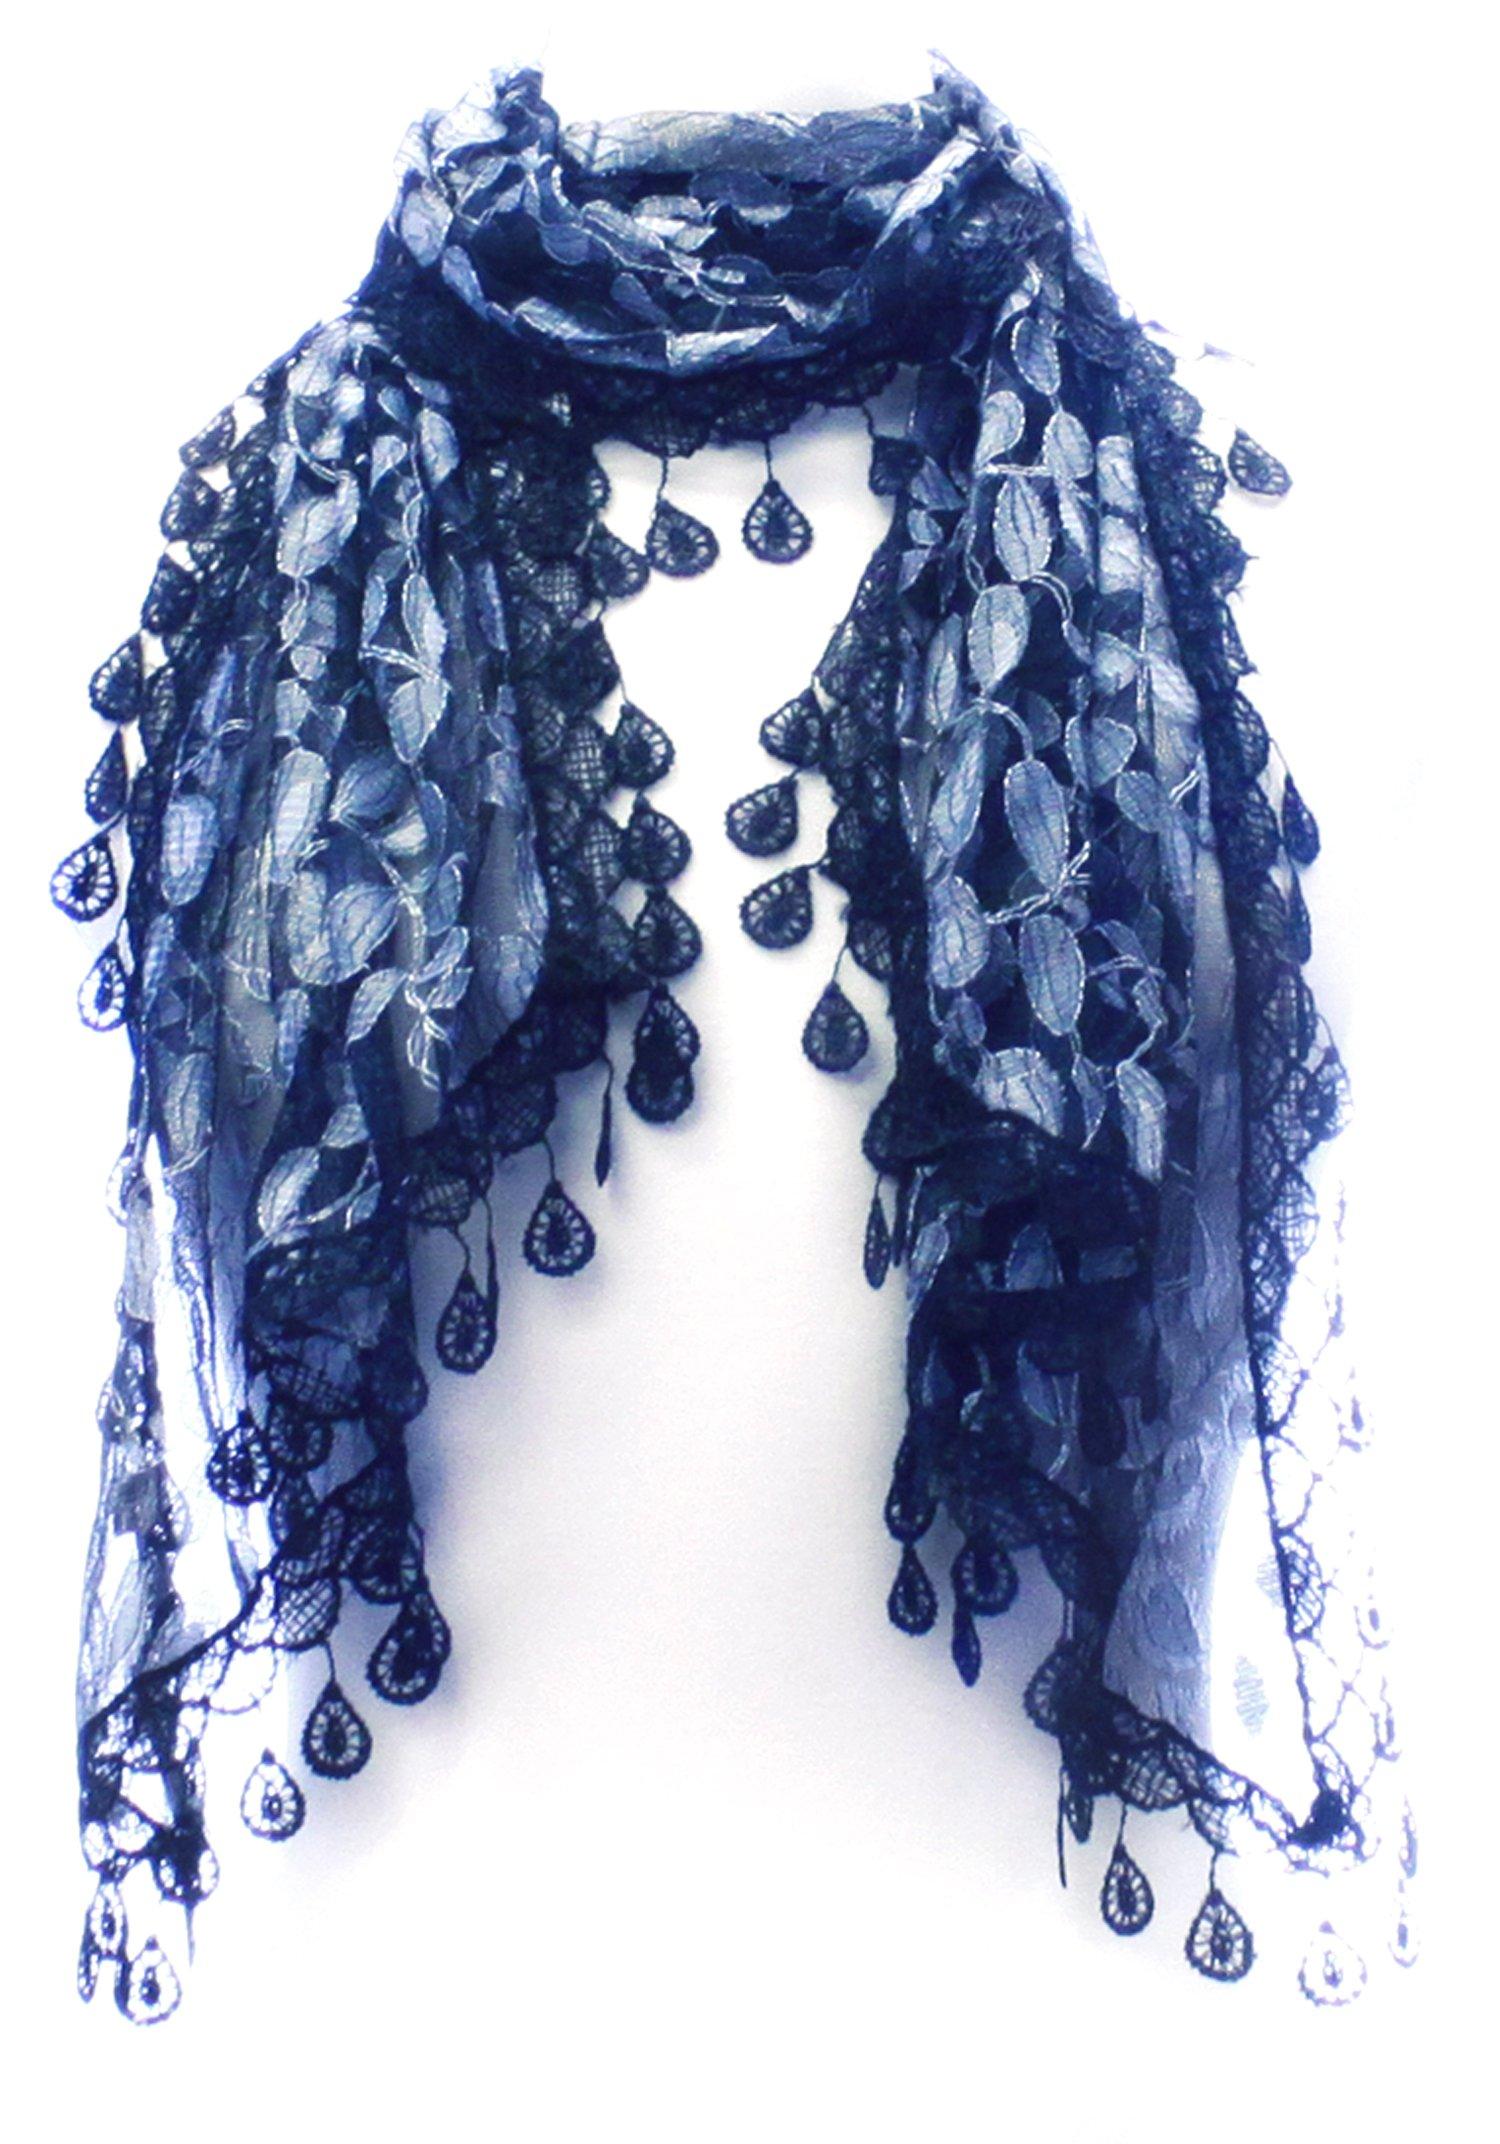 L Lace Scarf Womens Elegant Chiffon Embroidered Fashion Tassels Many Styles